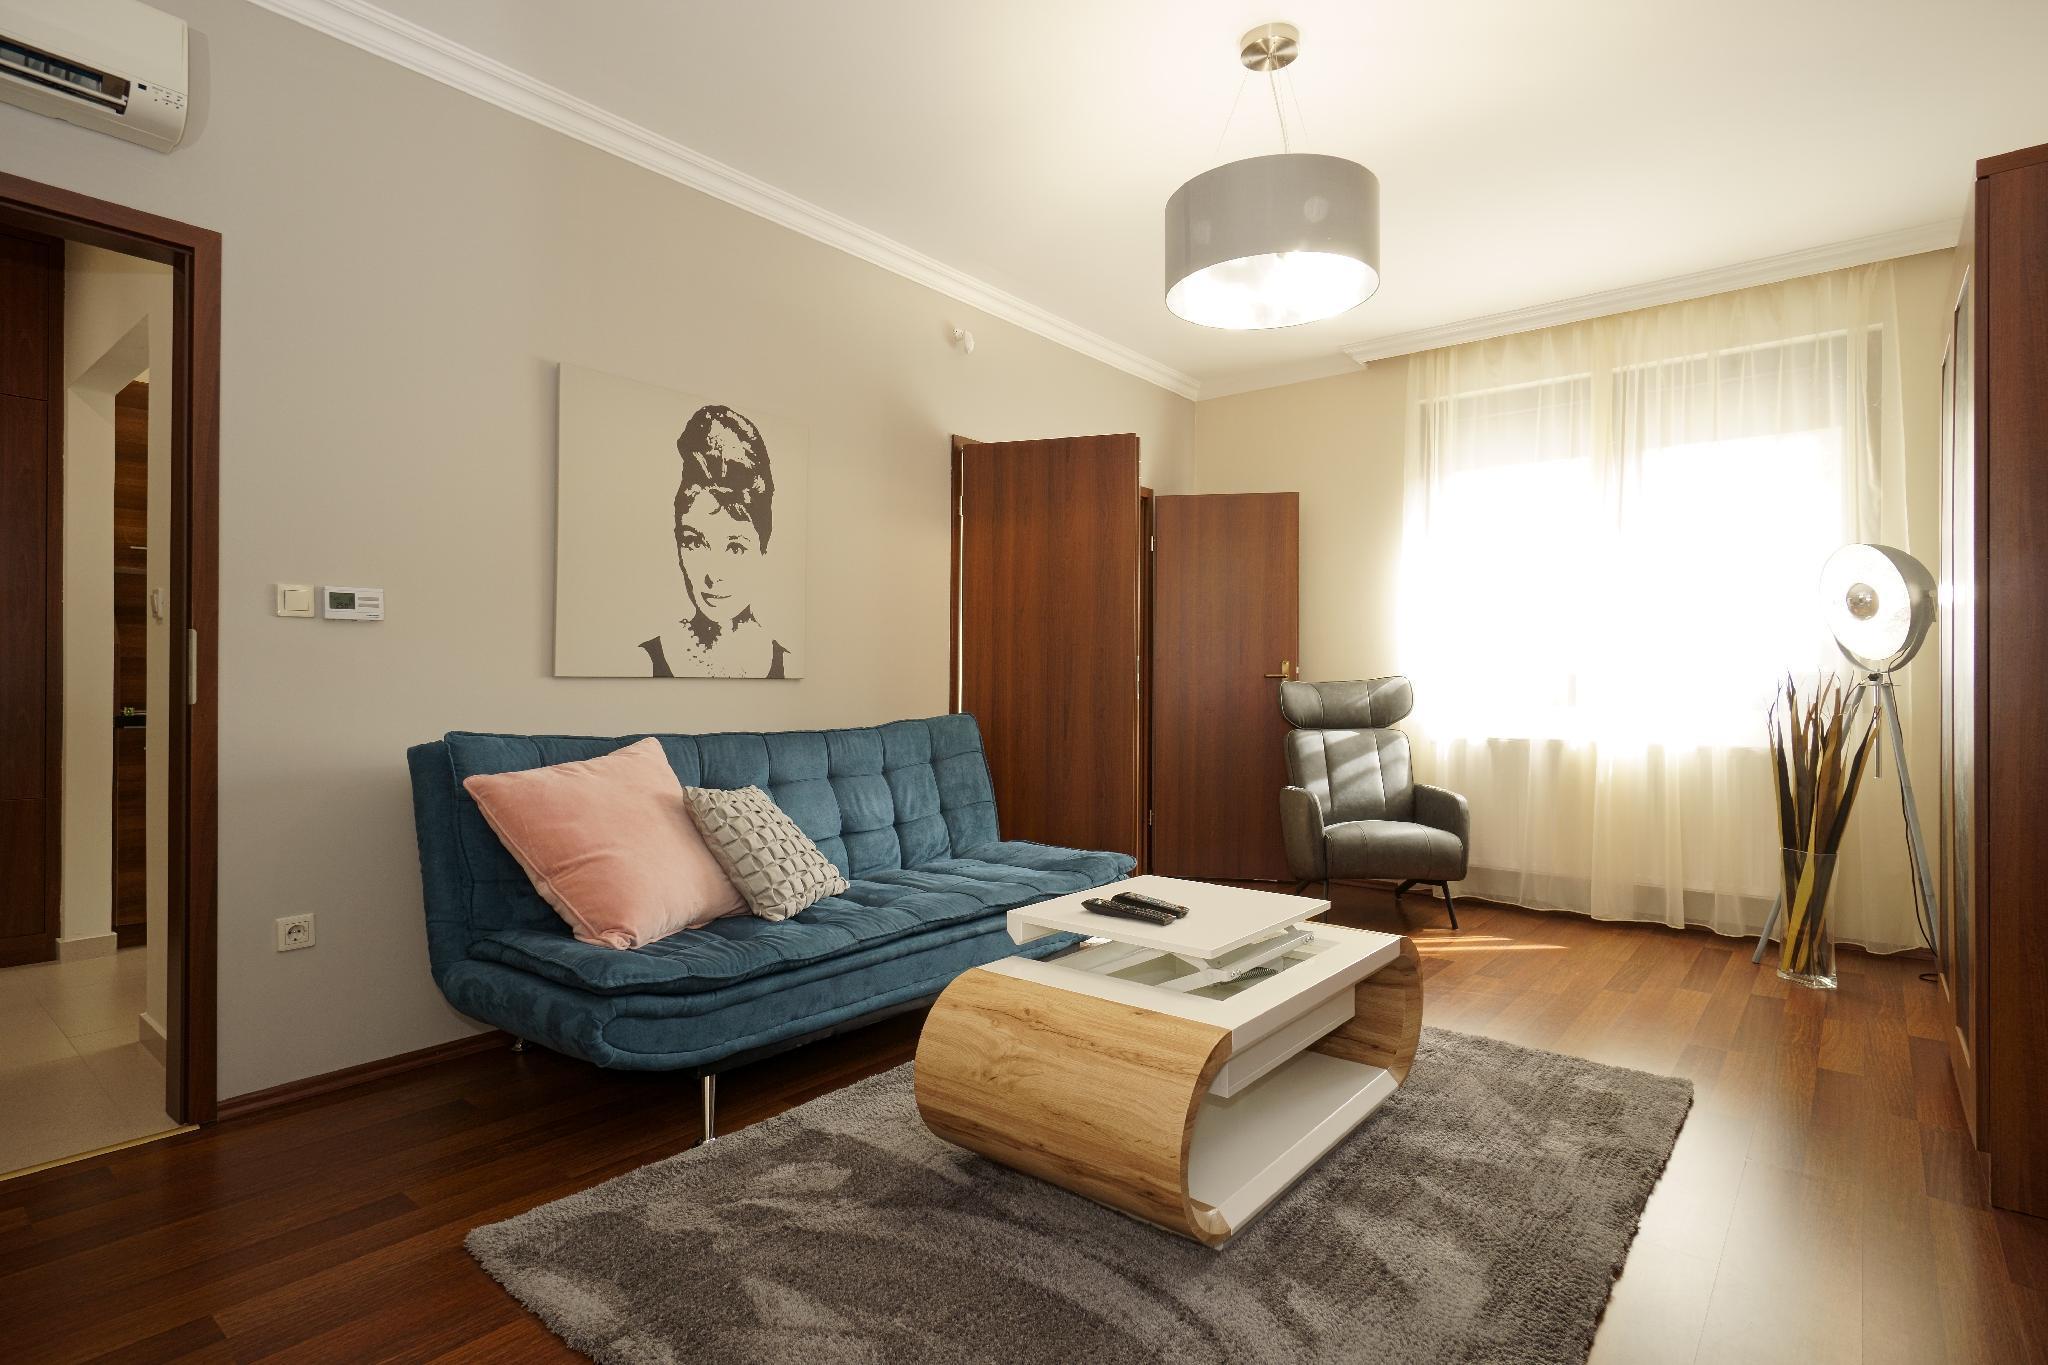 Central Apartment Kecskemet